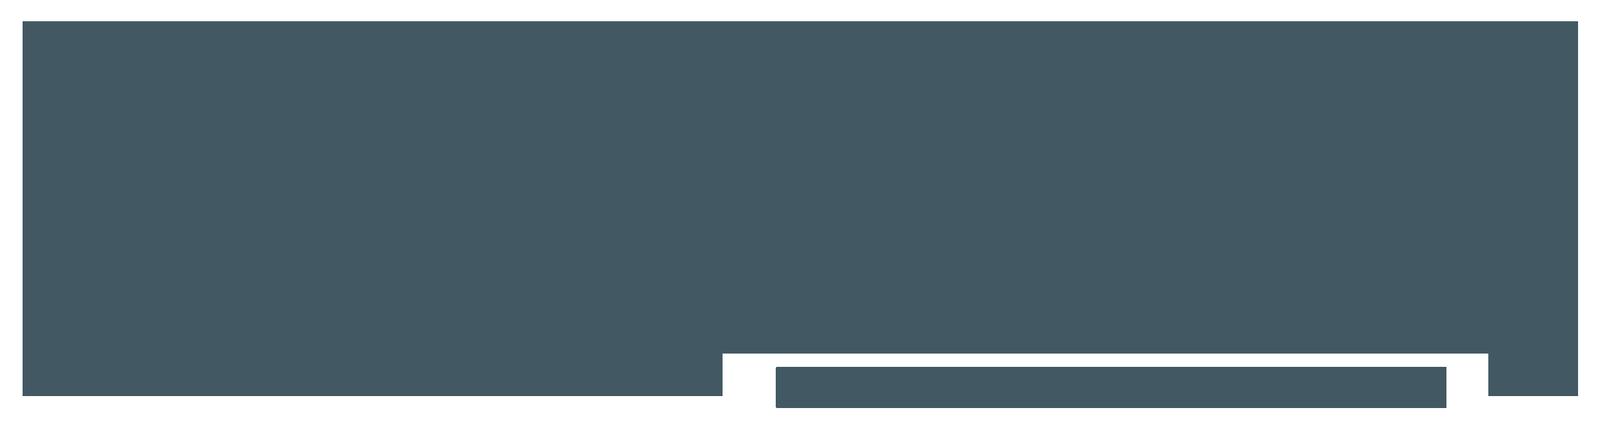 Soberalski-Logo(new)_preview.png